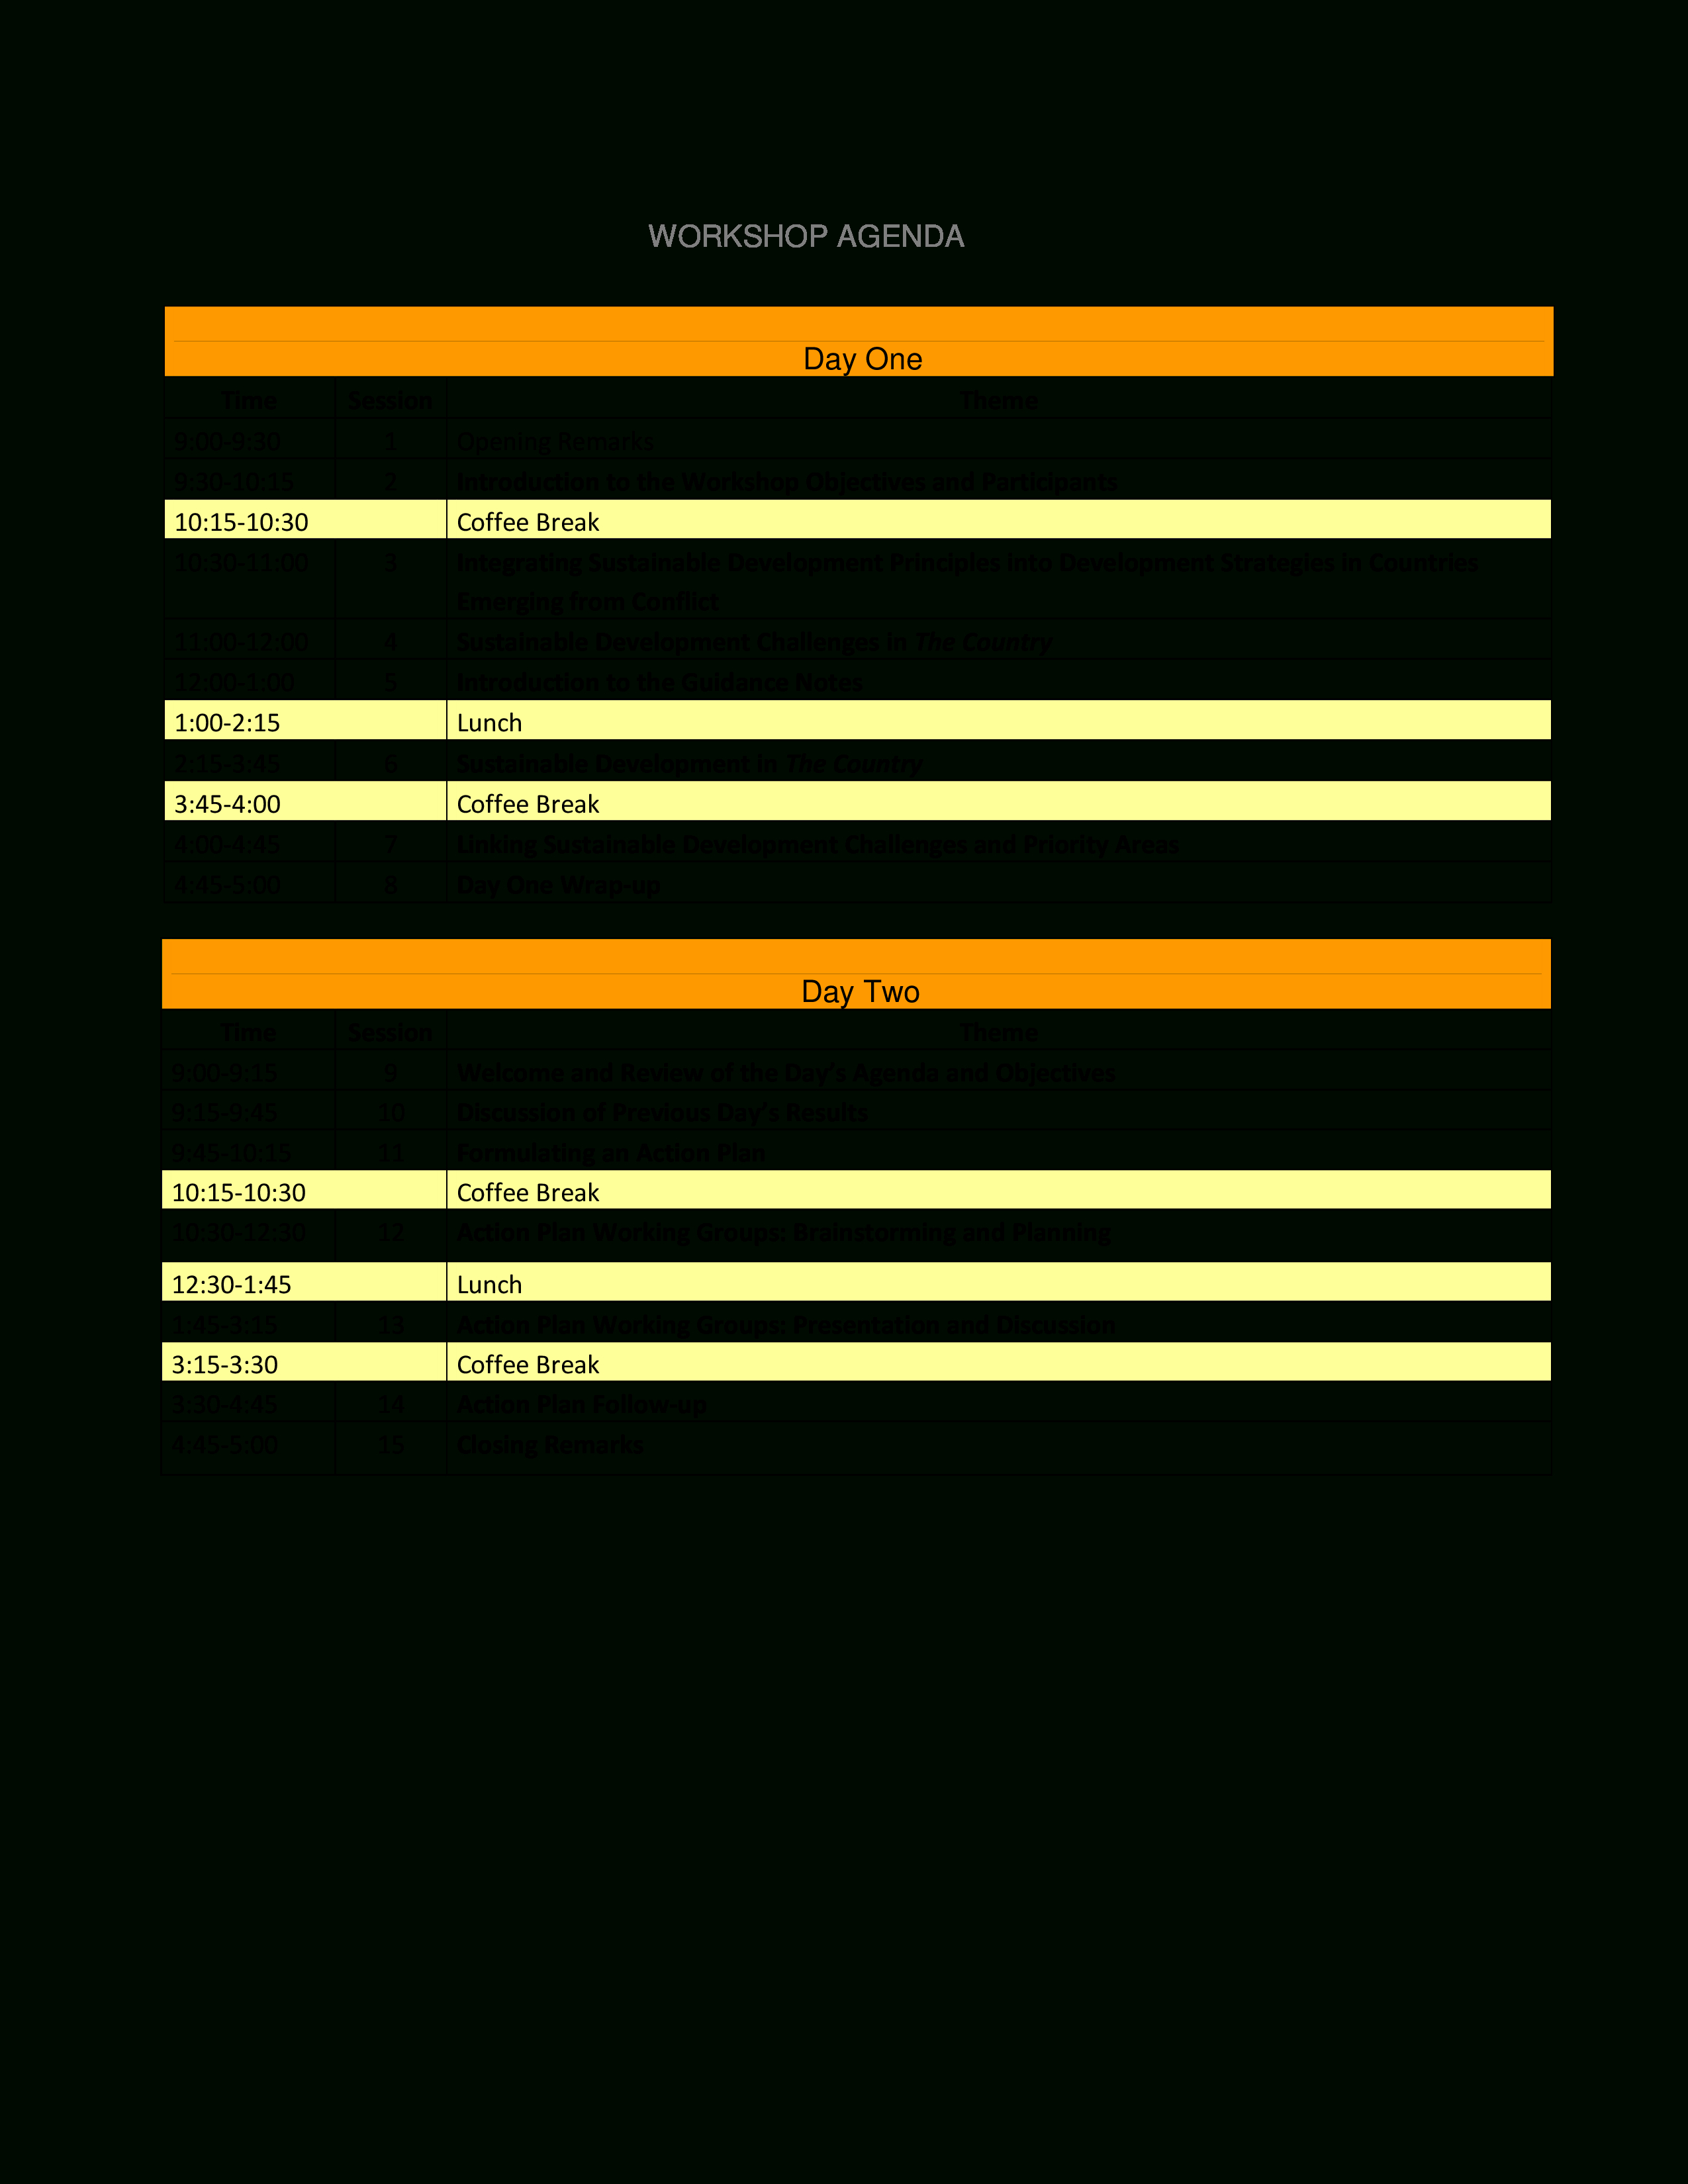 Sample Workshop Agenda  Templates At Allbusinesstemplates With Regard To Workshop Agenda Template